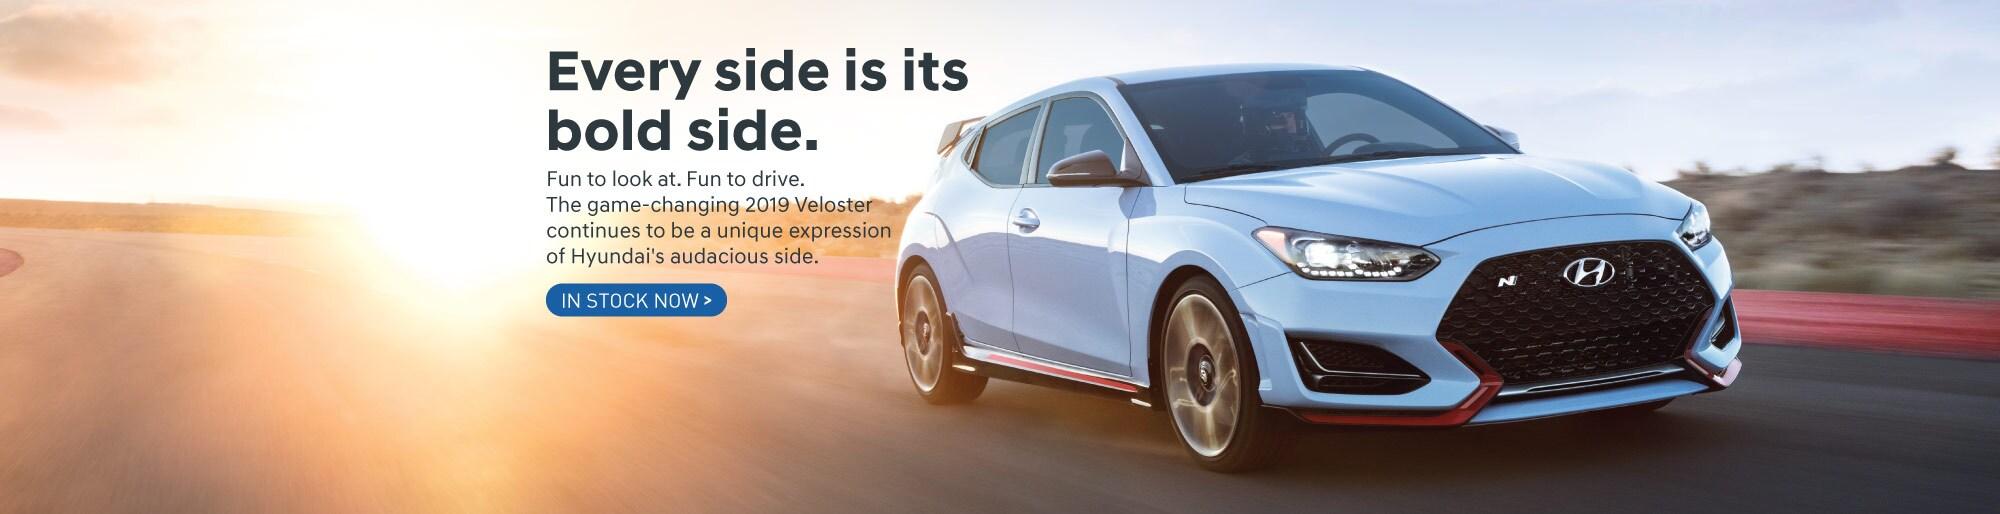 Lithia Hyundai Fresno >> New & Used Car Dealer in Fresno, CA | Lithia Hyundai of Fresno Serving Selma, Clovis, Madera and ...